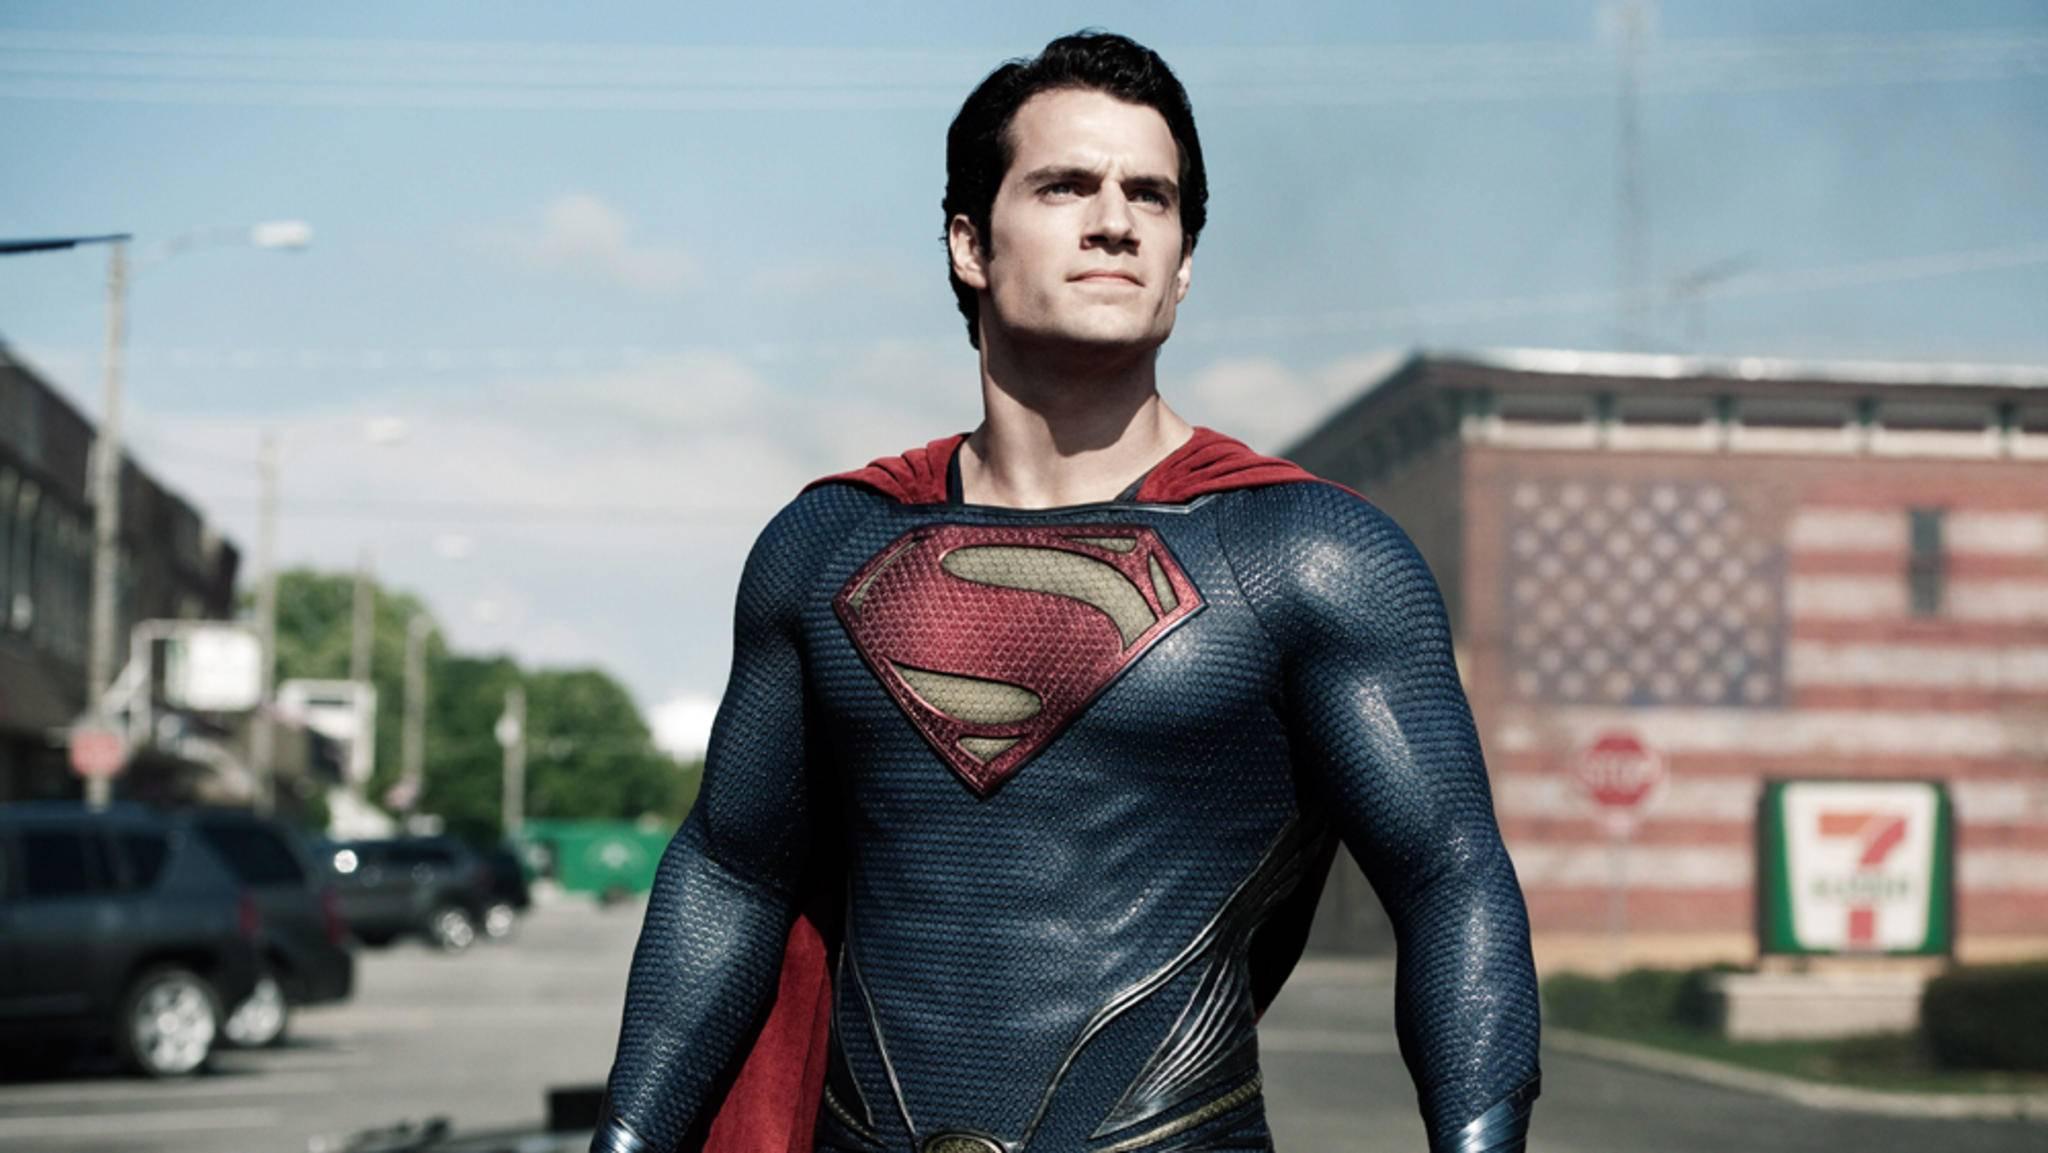 Wird Superman nach den zuletzt düsteren DCEU-Filmen wieder zum schillernden Hoffnungsträger?